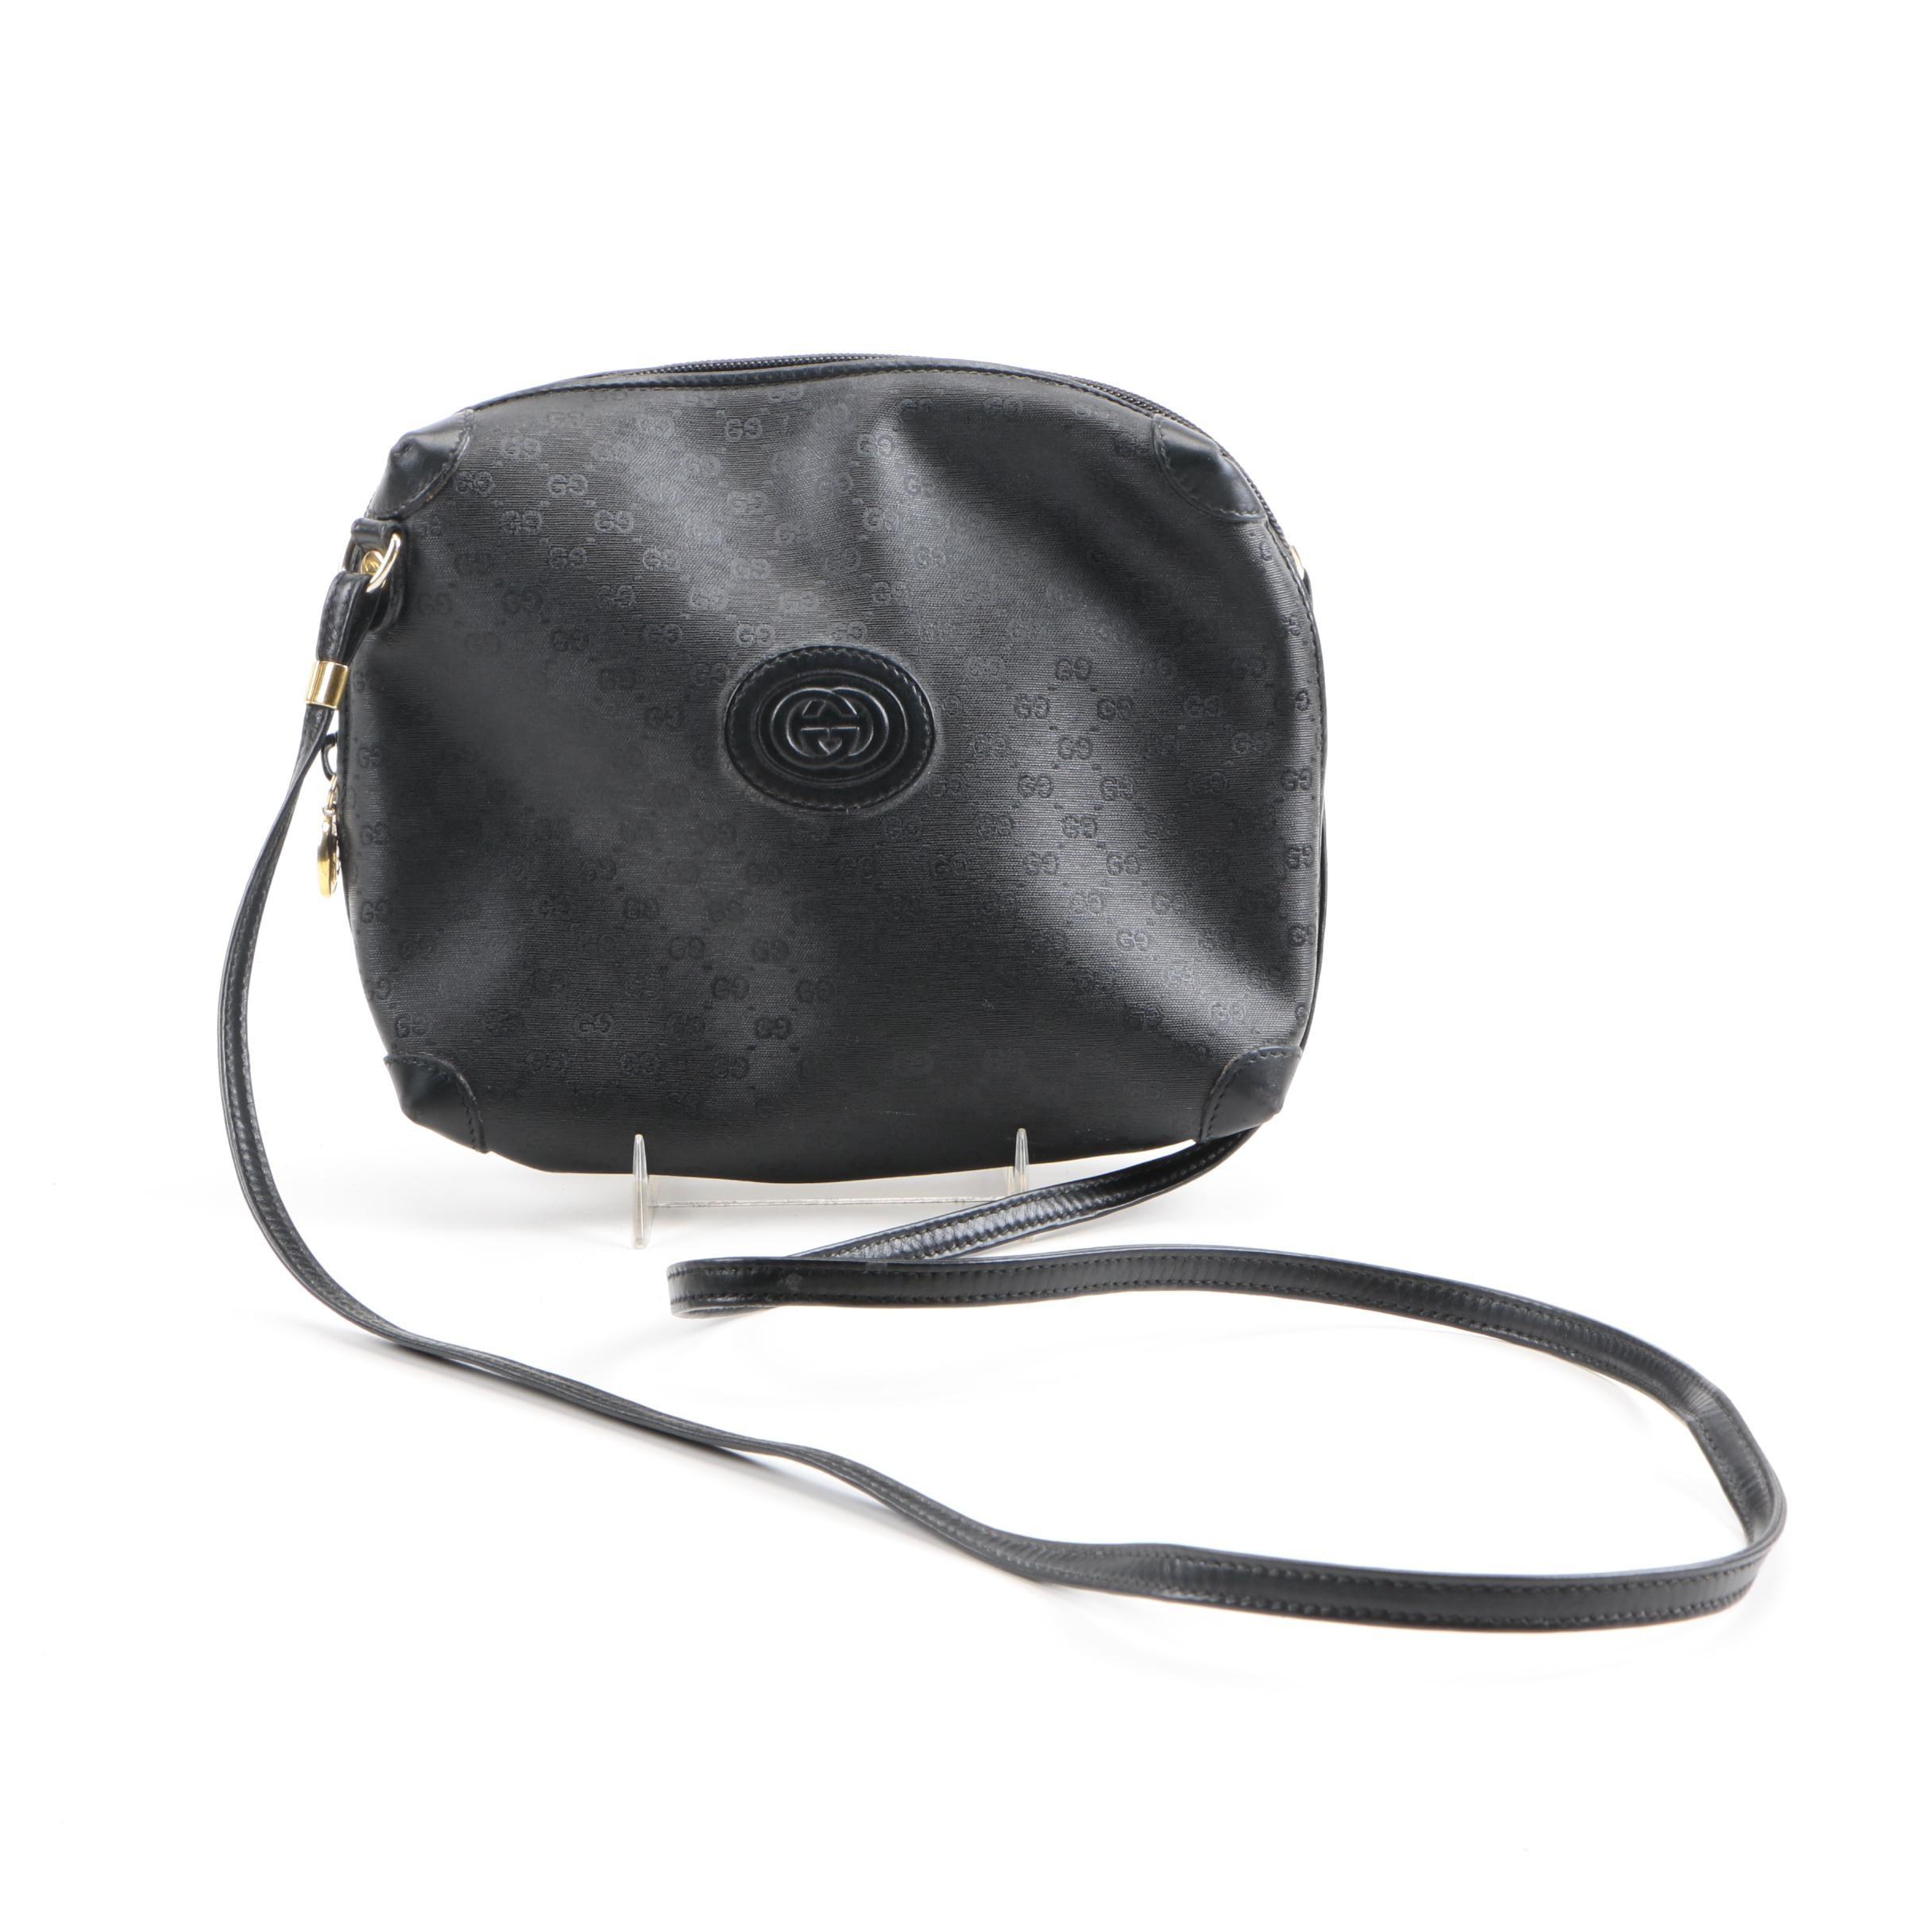 Gucci Black Supreme Canvas Crossbody Bag